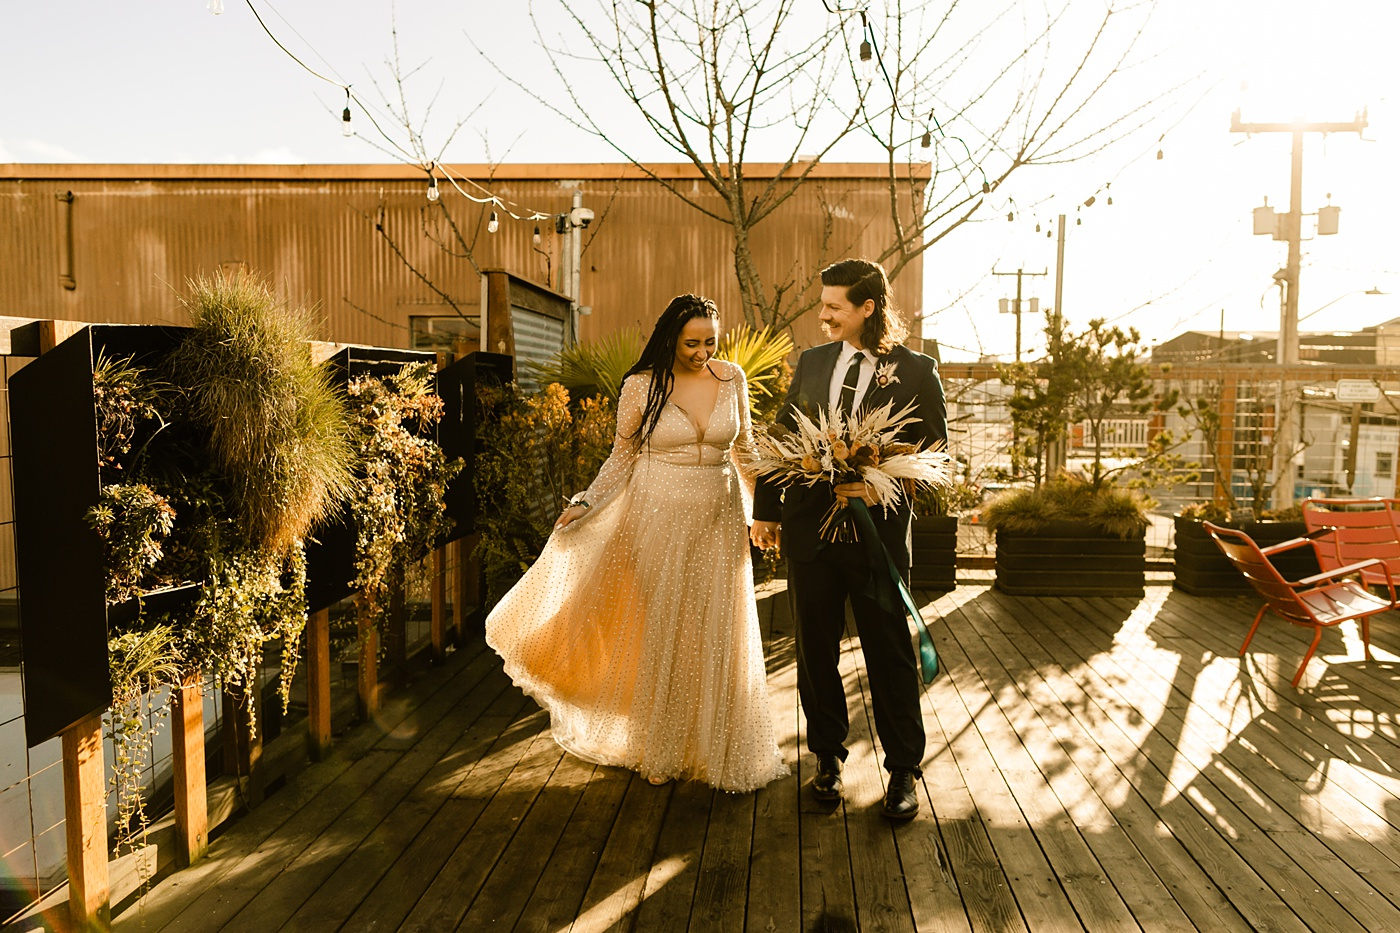 Withinsodo wedding photographer rooftop photos sunset photography